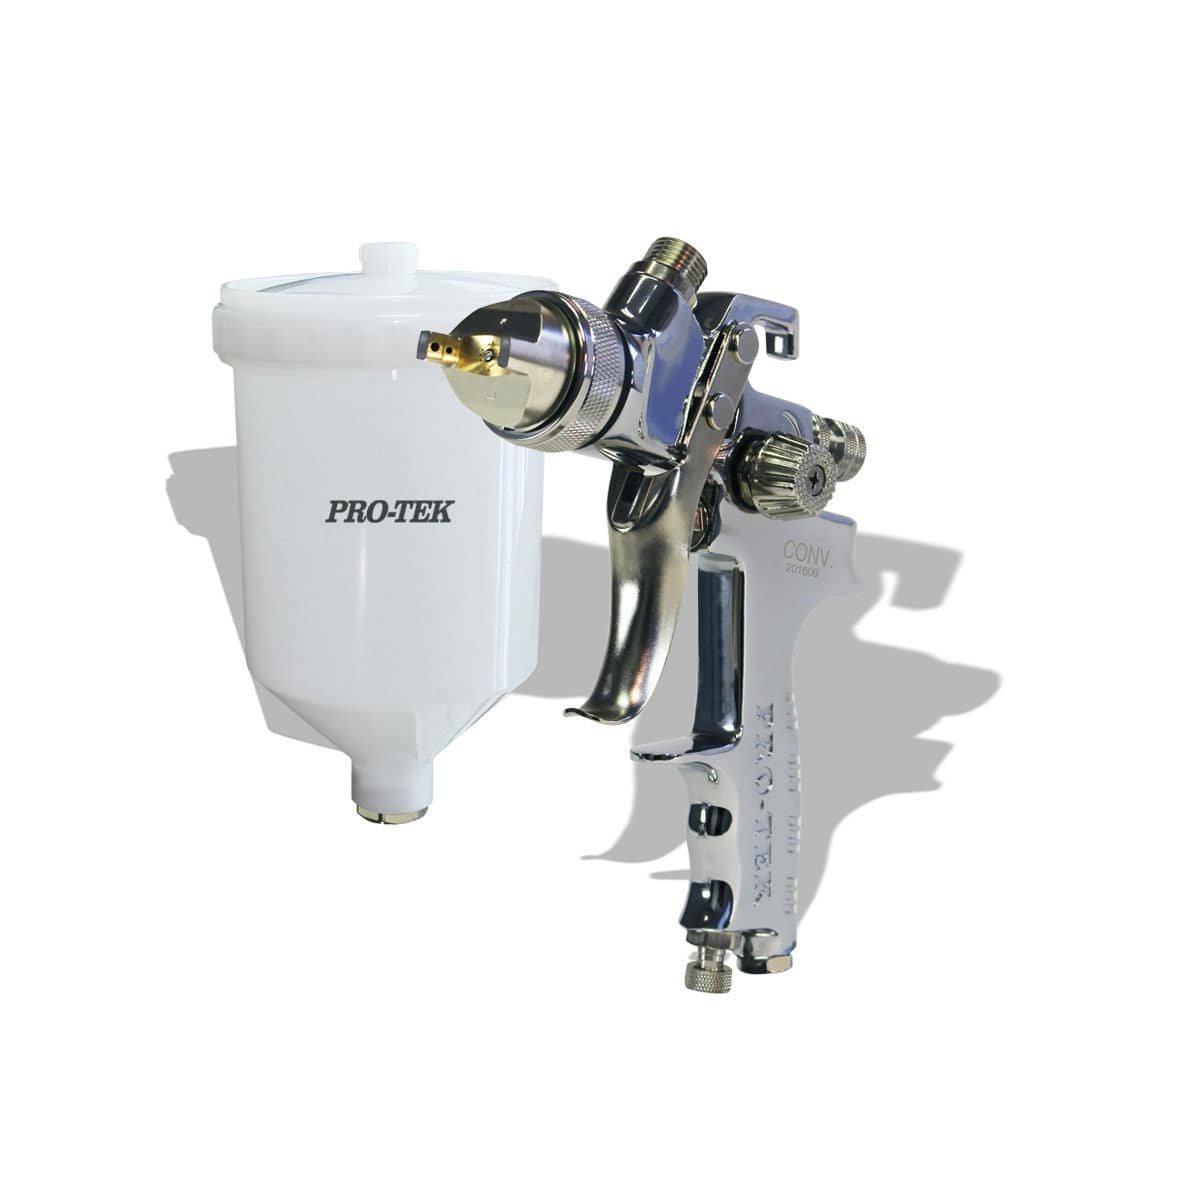 Spray Gun For Paint Pneumatic Gravity Feed Pro Tek 2600 Series